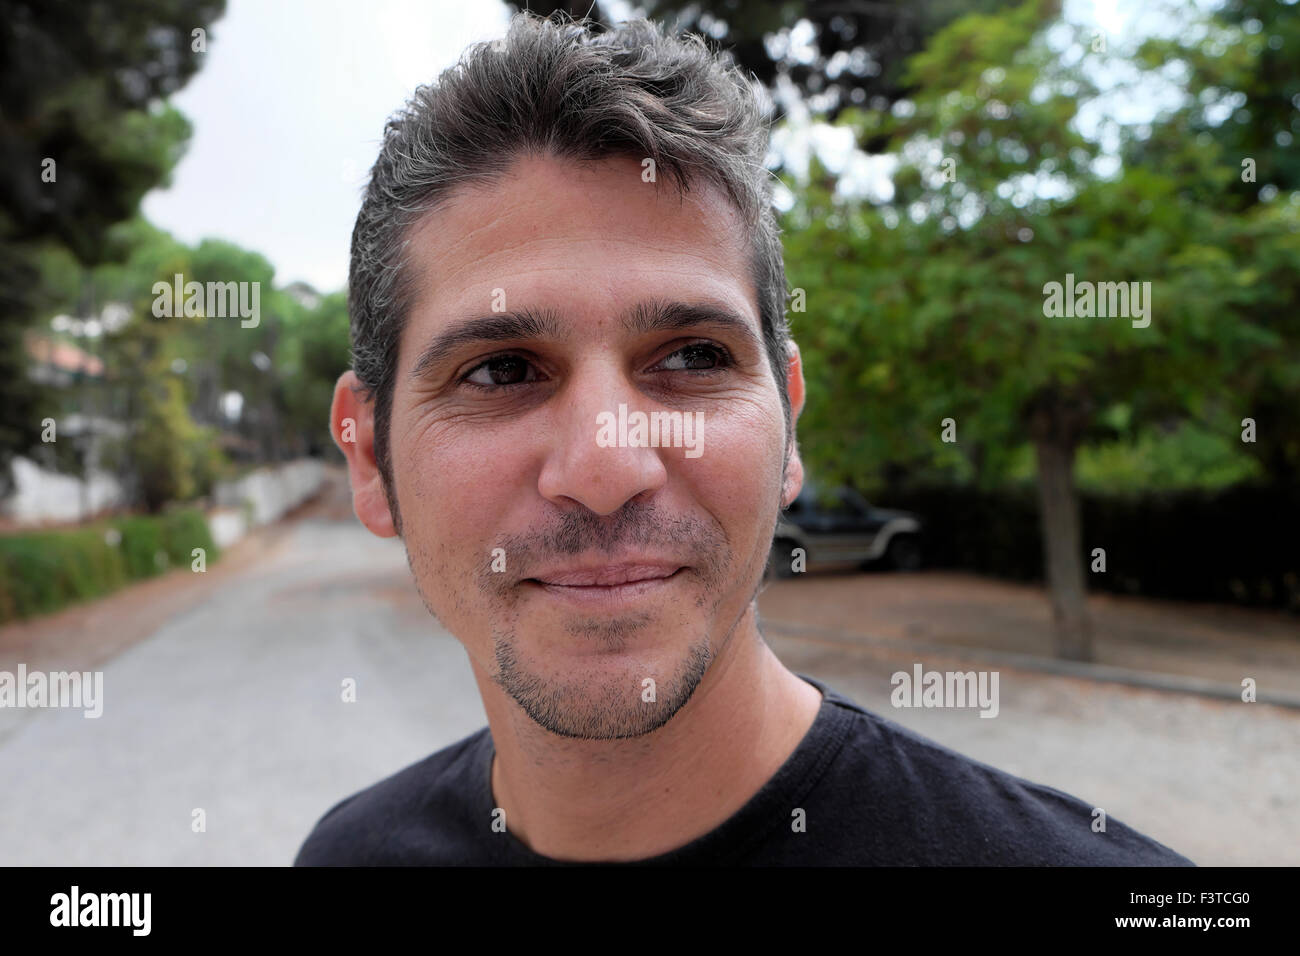 Un guapo hombre sonriendo chipriota de pie fuera en la parte septentrional de Chipre KATHY DEWITT Imagen De Stock